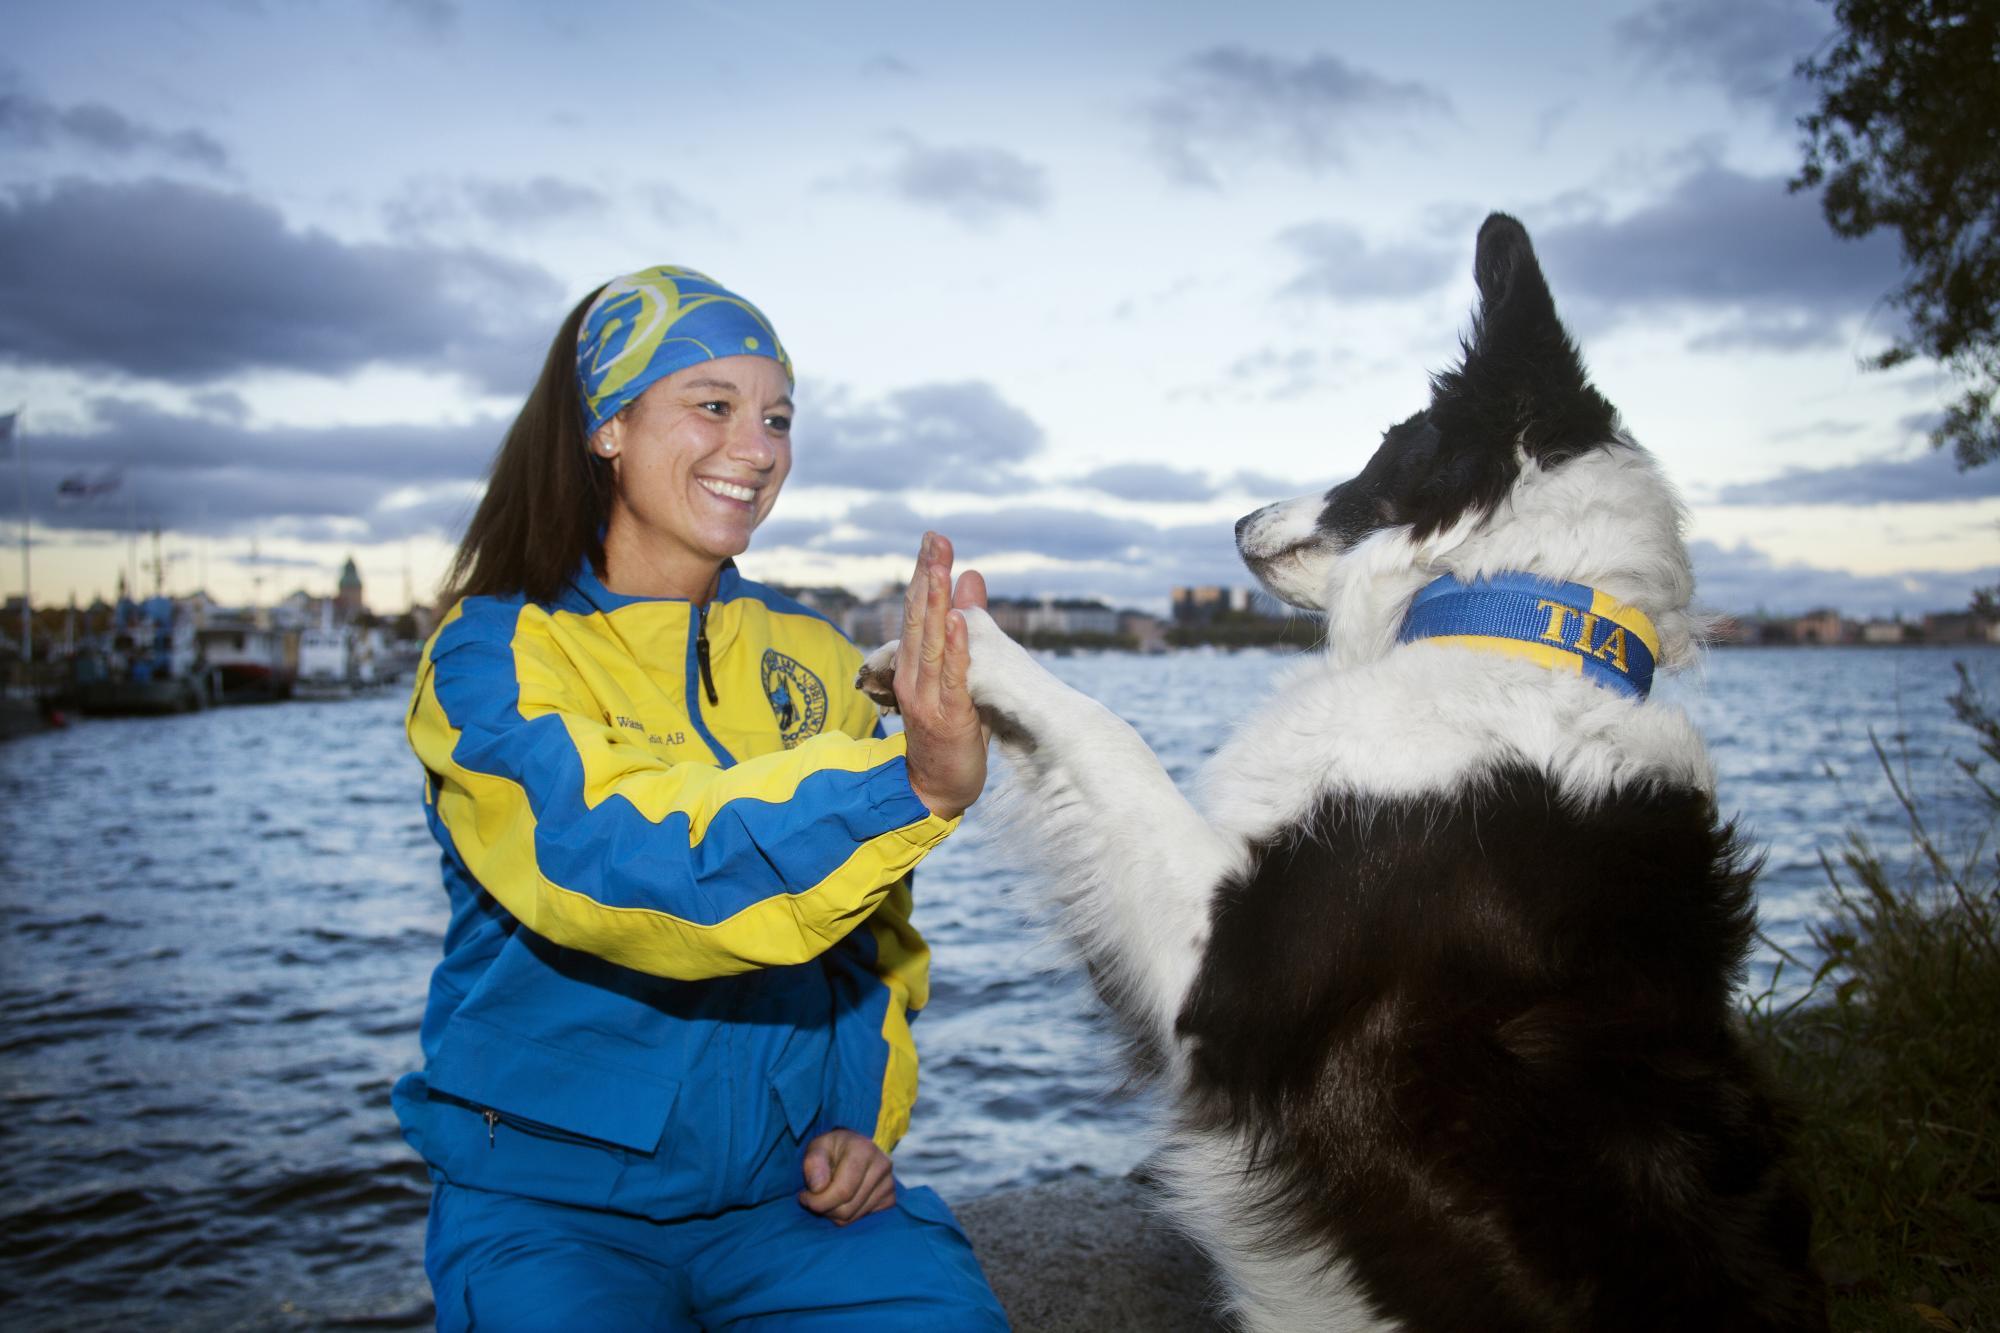 "Tia ger Sofia en ""femma"". Paret har representerat Sverige i lydnads VM. Självklart matchar Tias halsband Sofias landslagsdress."